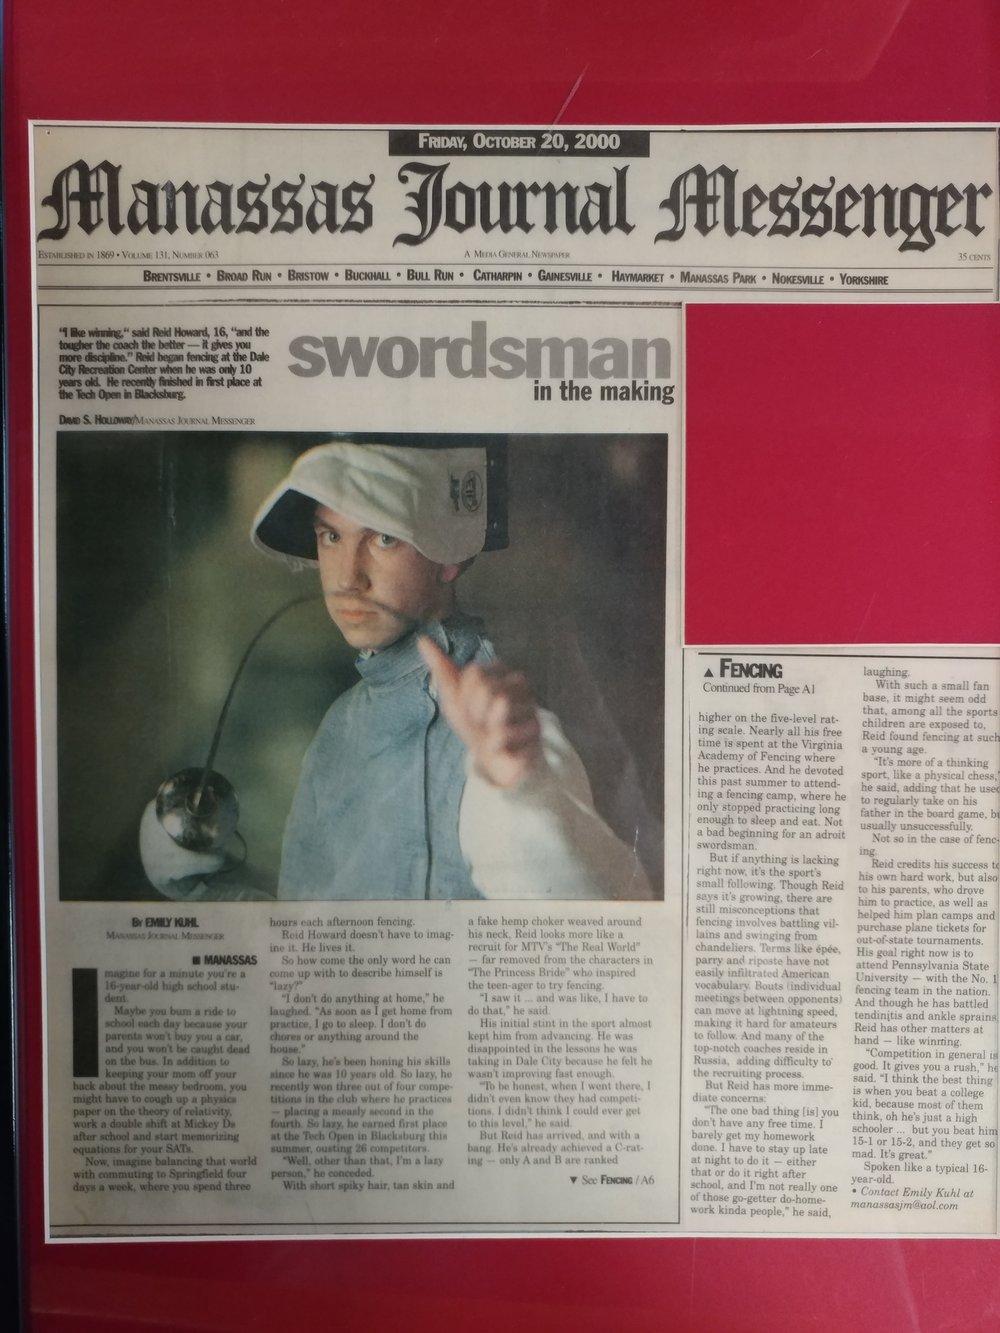 Manassas Journal Messenger